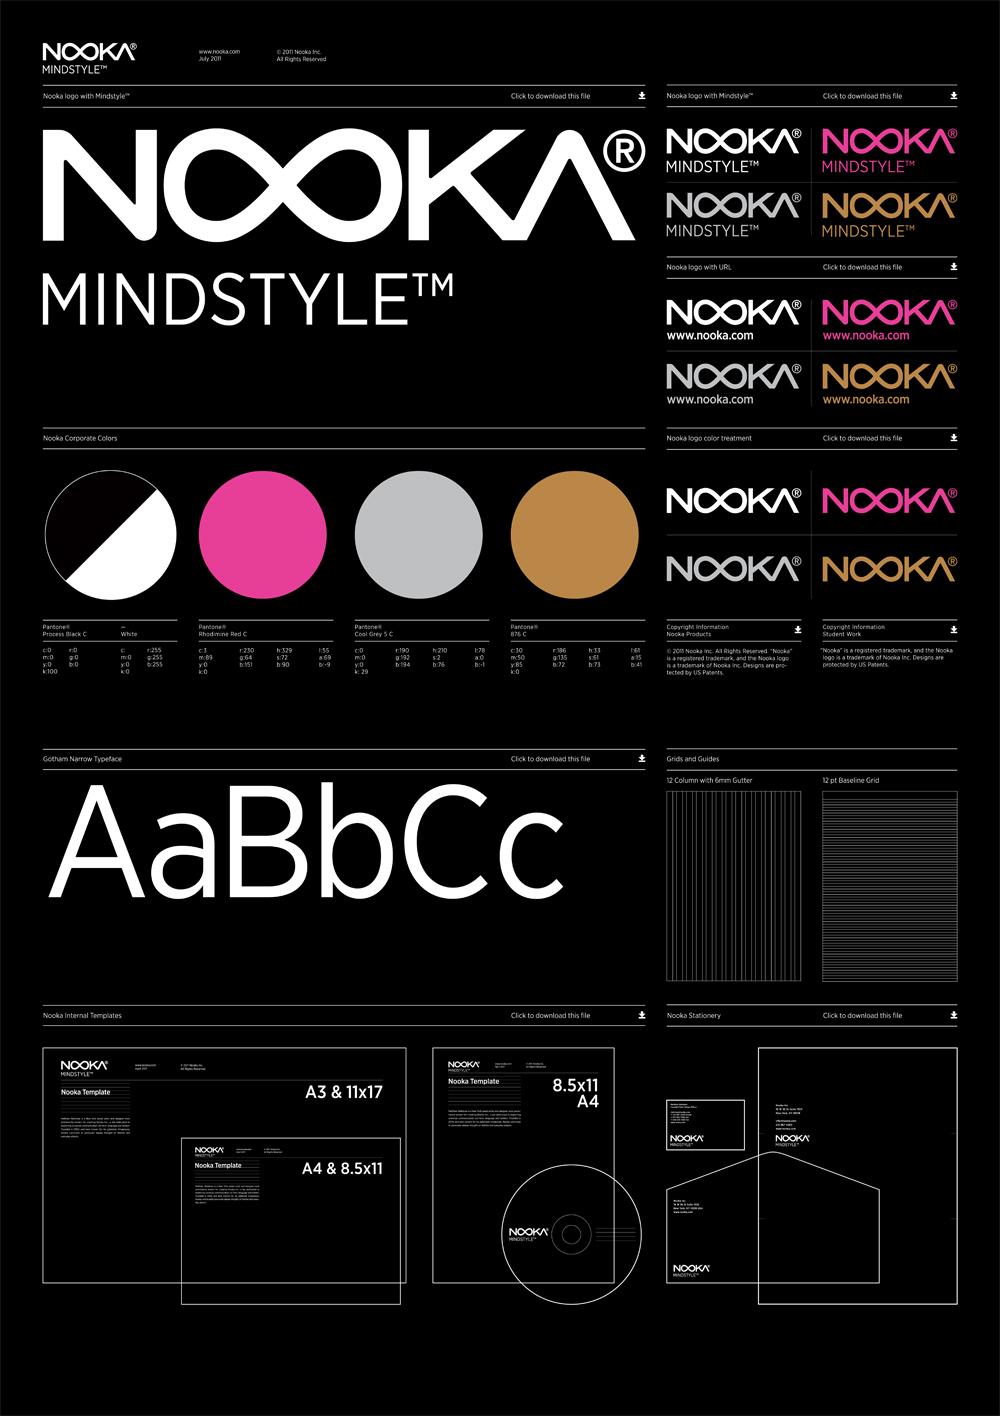 Poster design guidelines - Nooka